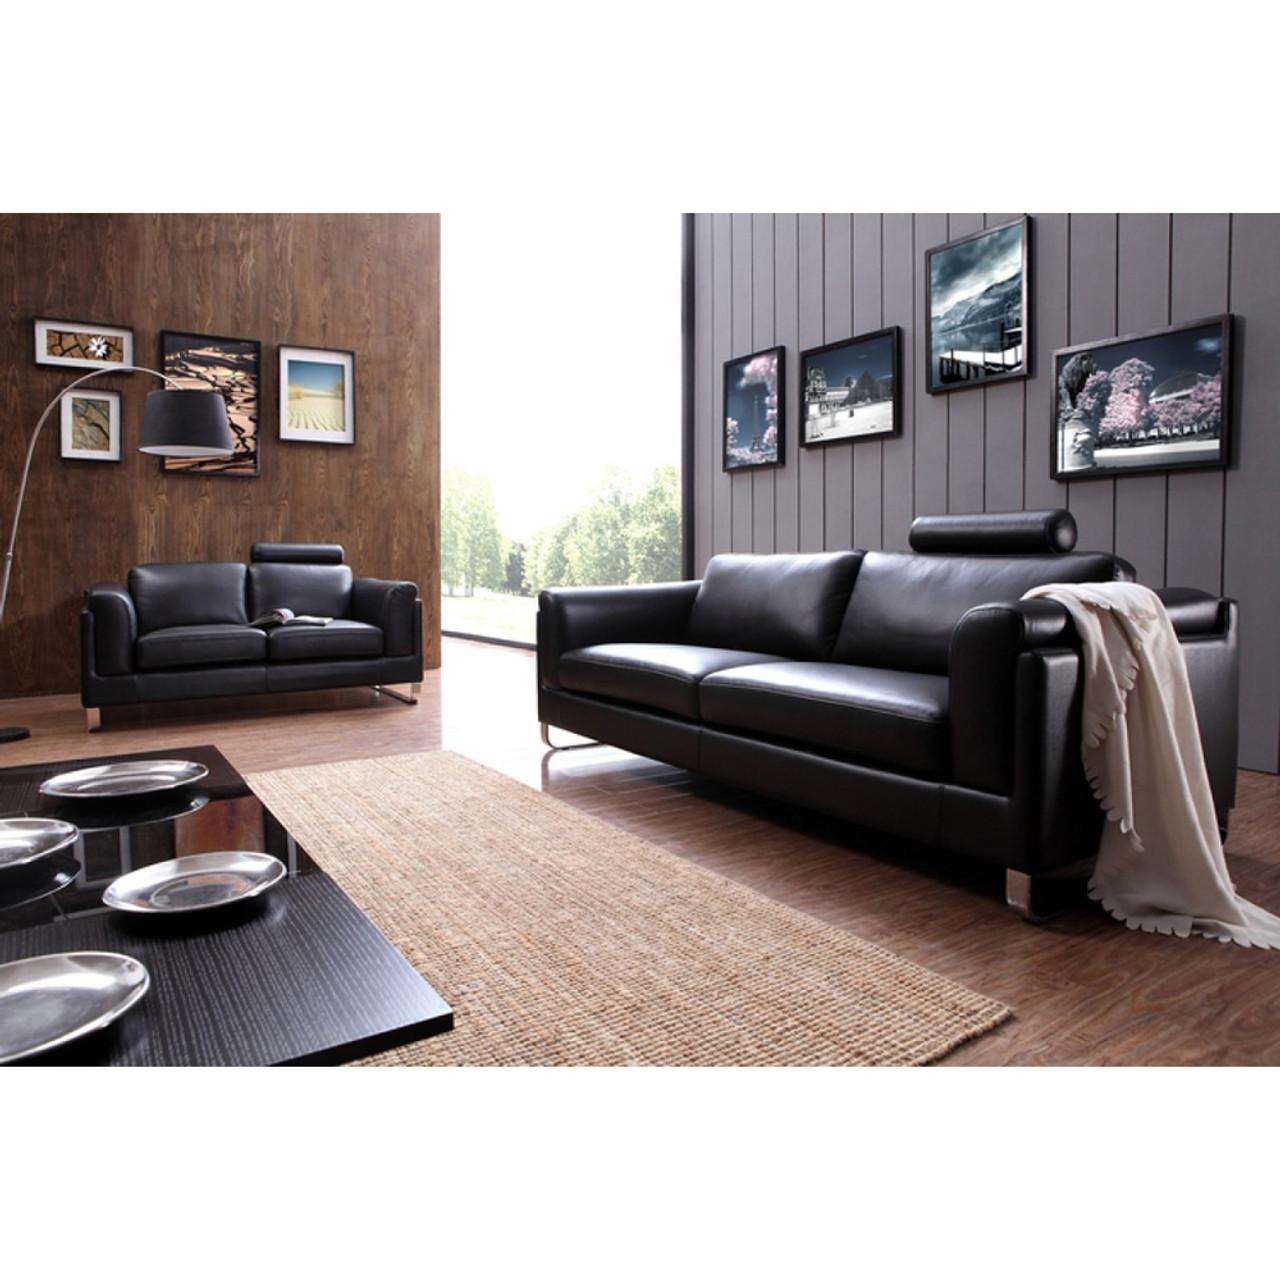 - Divani Casa 0875 Modern Black Leather Sofa Set - Lounge LA